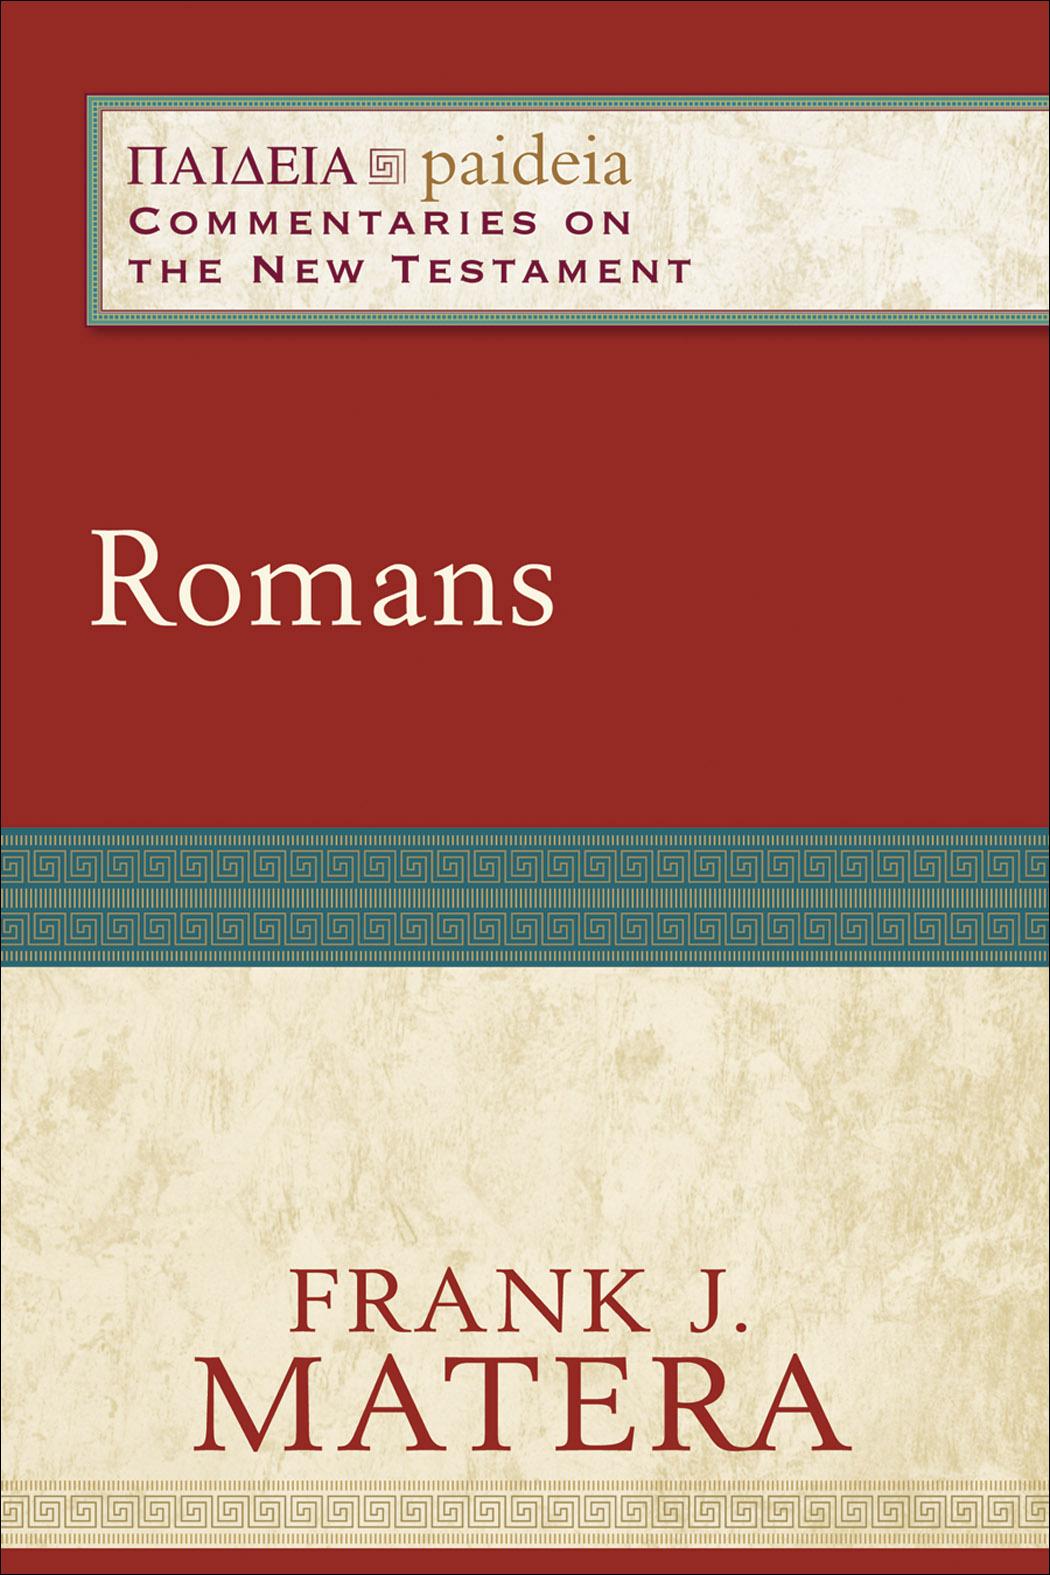 an essay on theological method